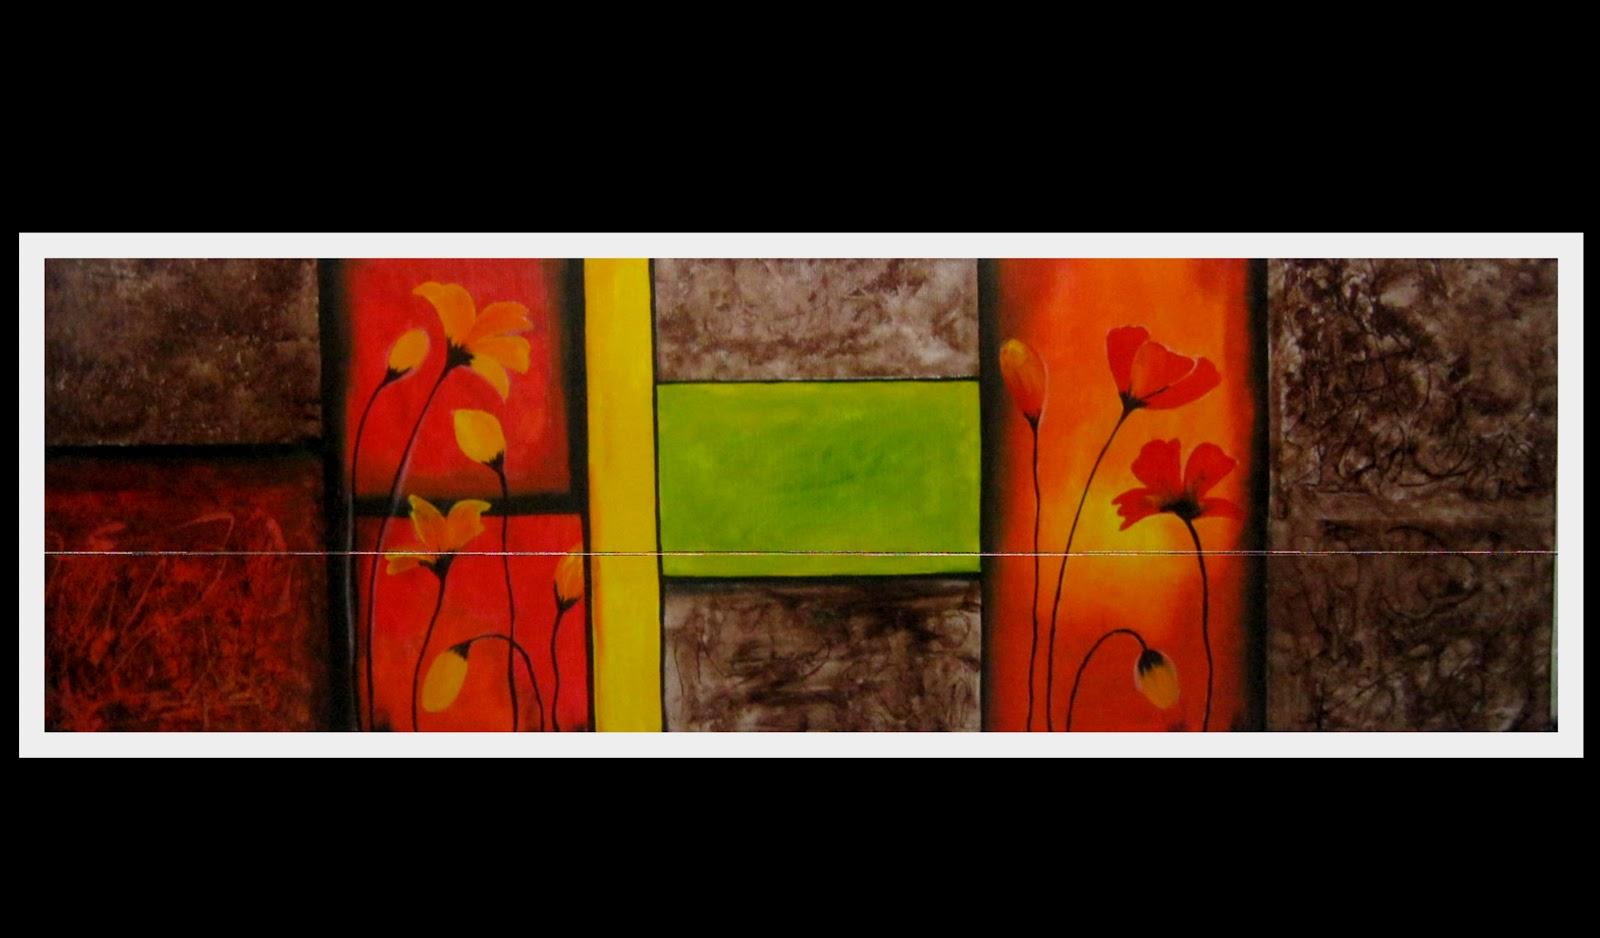 Lukisan Abstrak Hem: Lukisan Abstrak Mei 2012